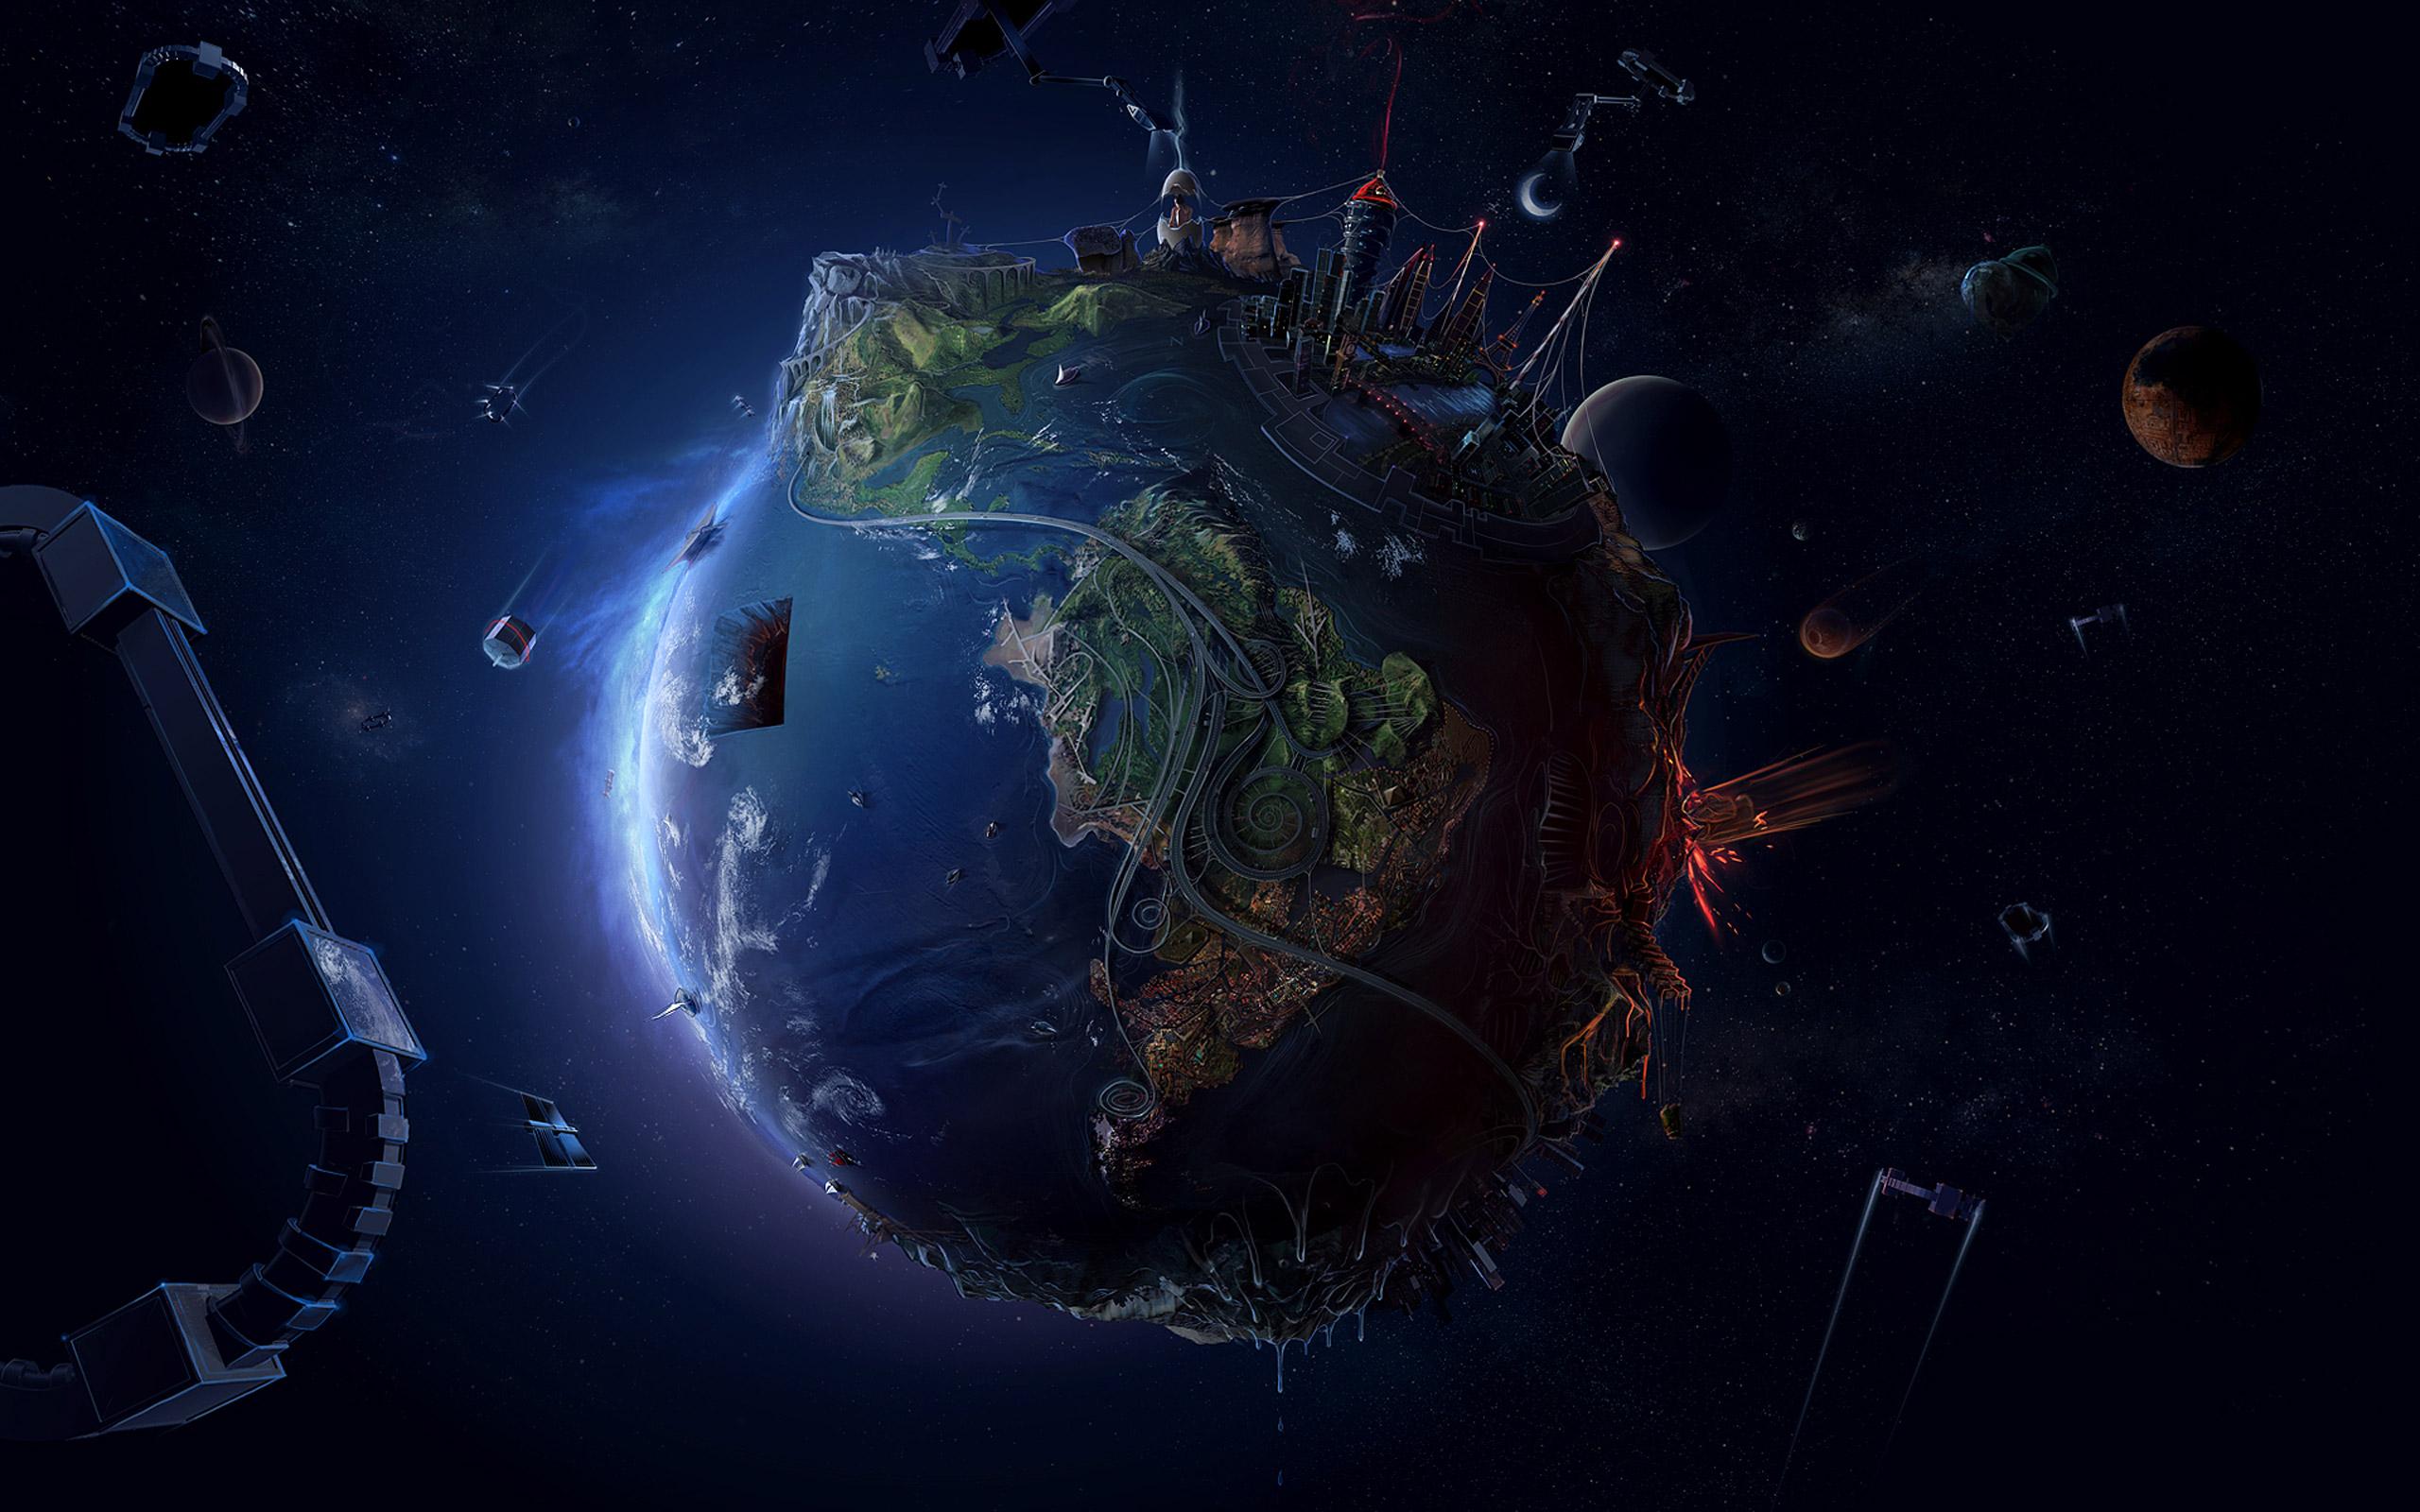 Earth at Night Wallpaper hd hd Wallpaper Earth Night 2560x1600